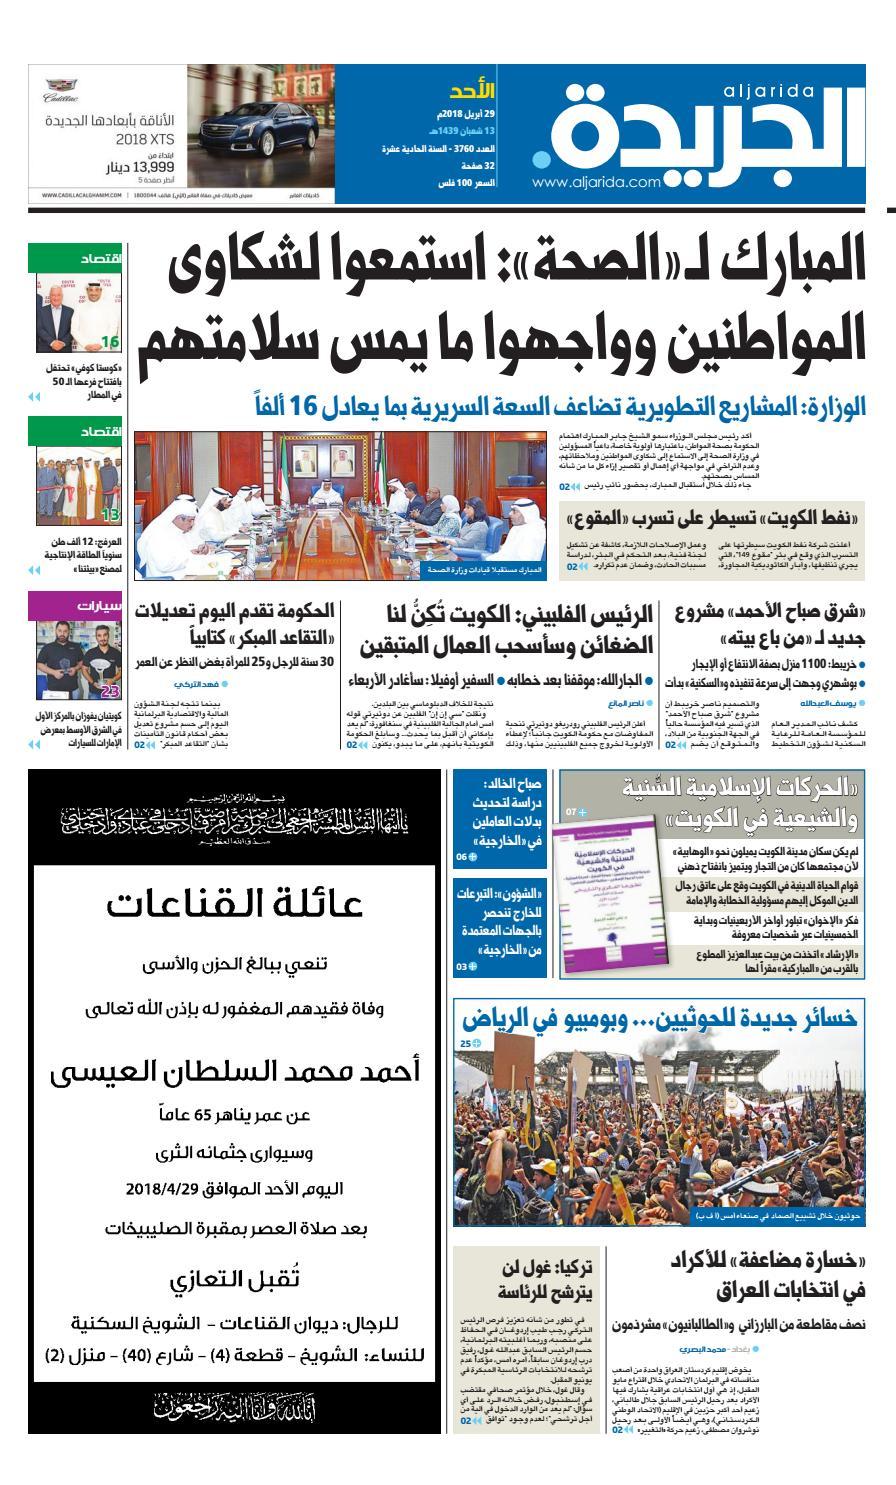 559239efbfa16 عدد الجريدة الأحد 29 أبريل 2018 by Aljarida Newspaper - issuu